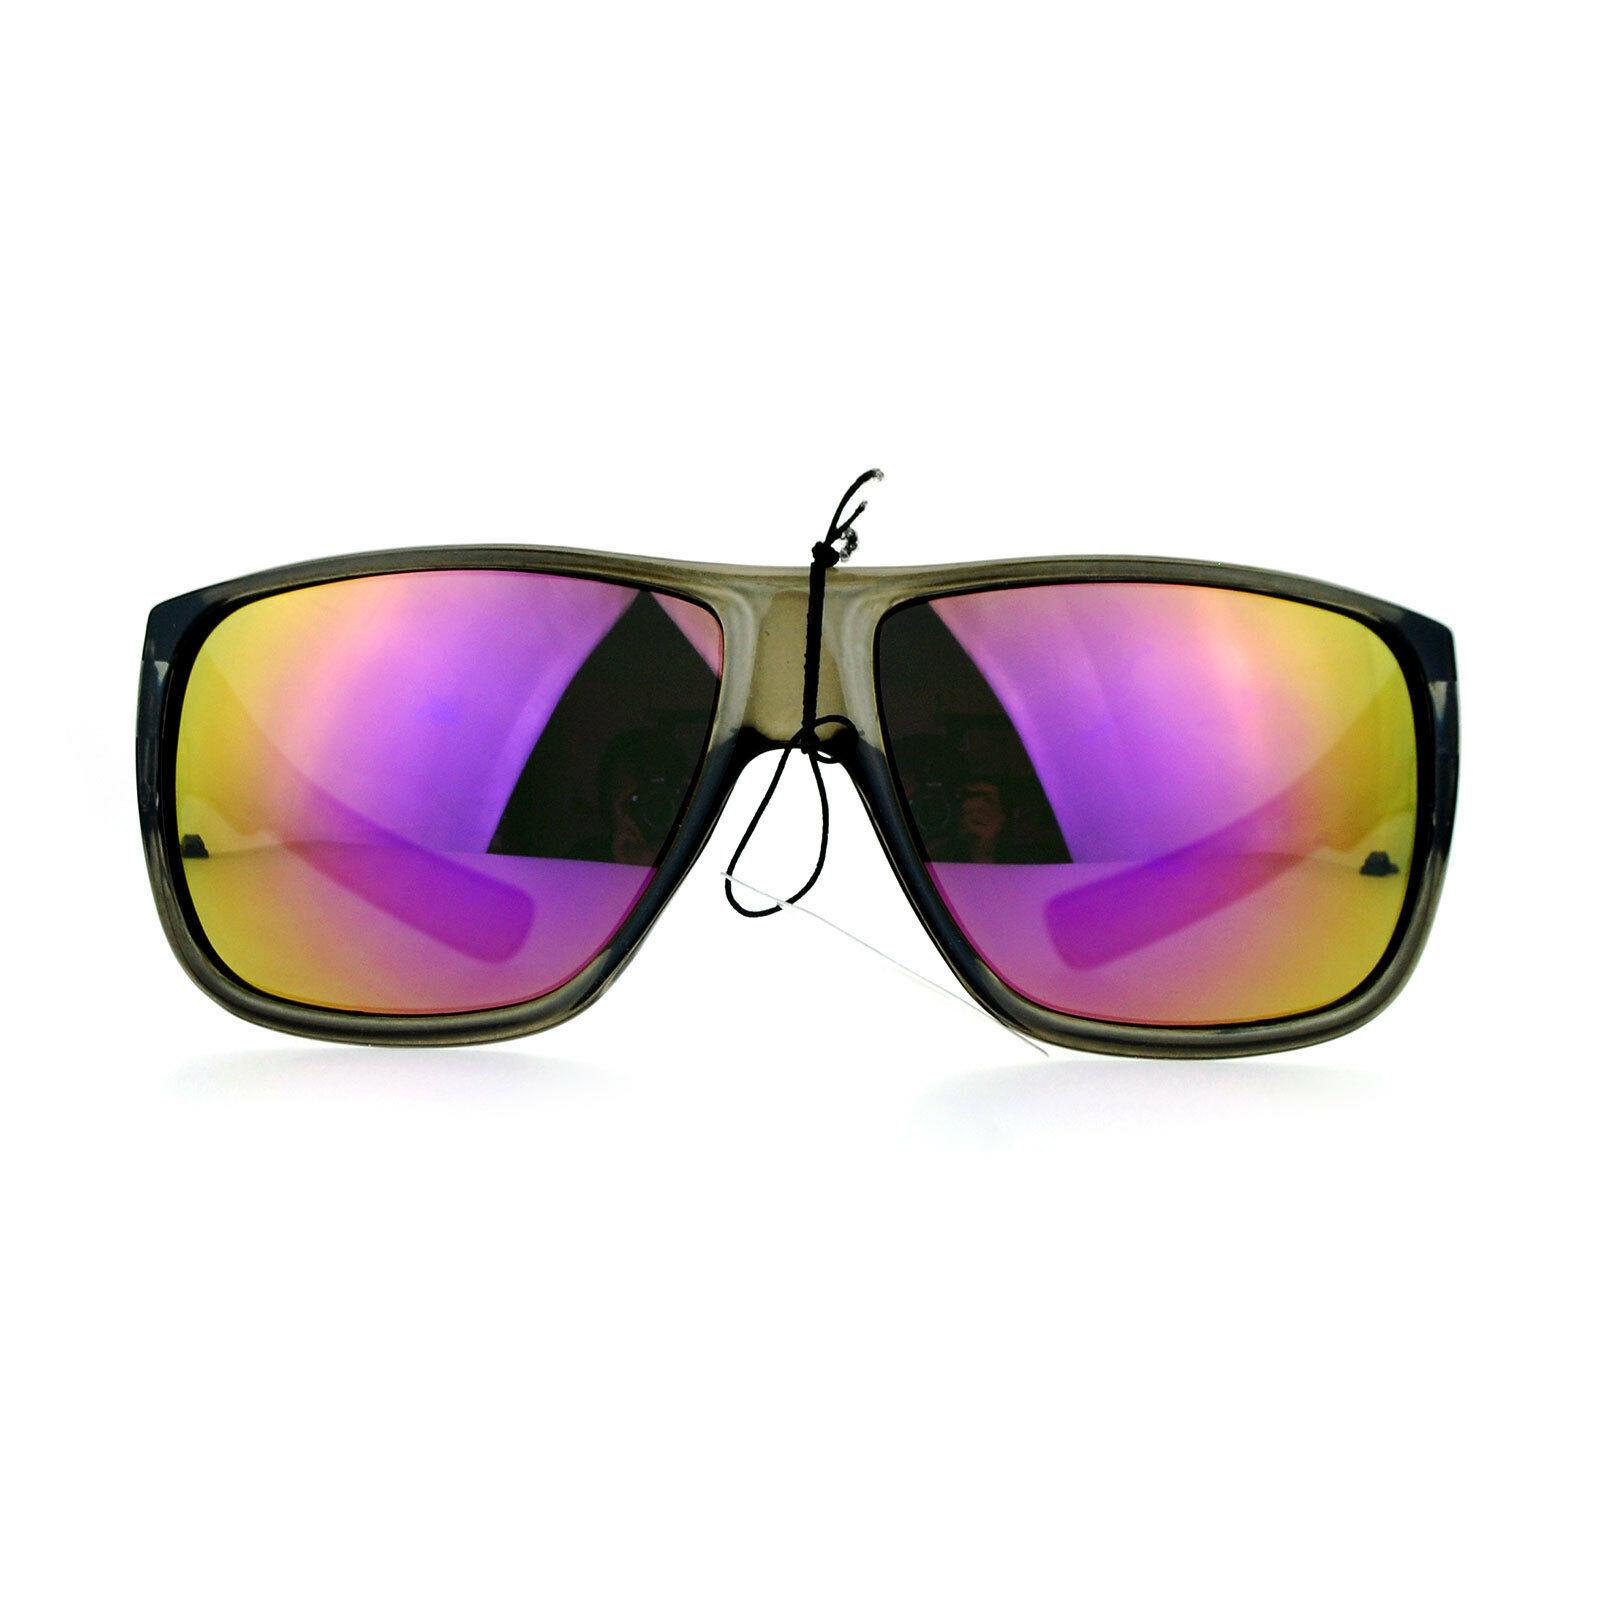 KUSH Sunglasses Slate Gray Square Frame Sports Fashion Mirror Lens